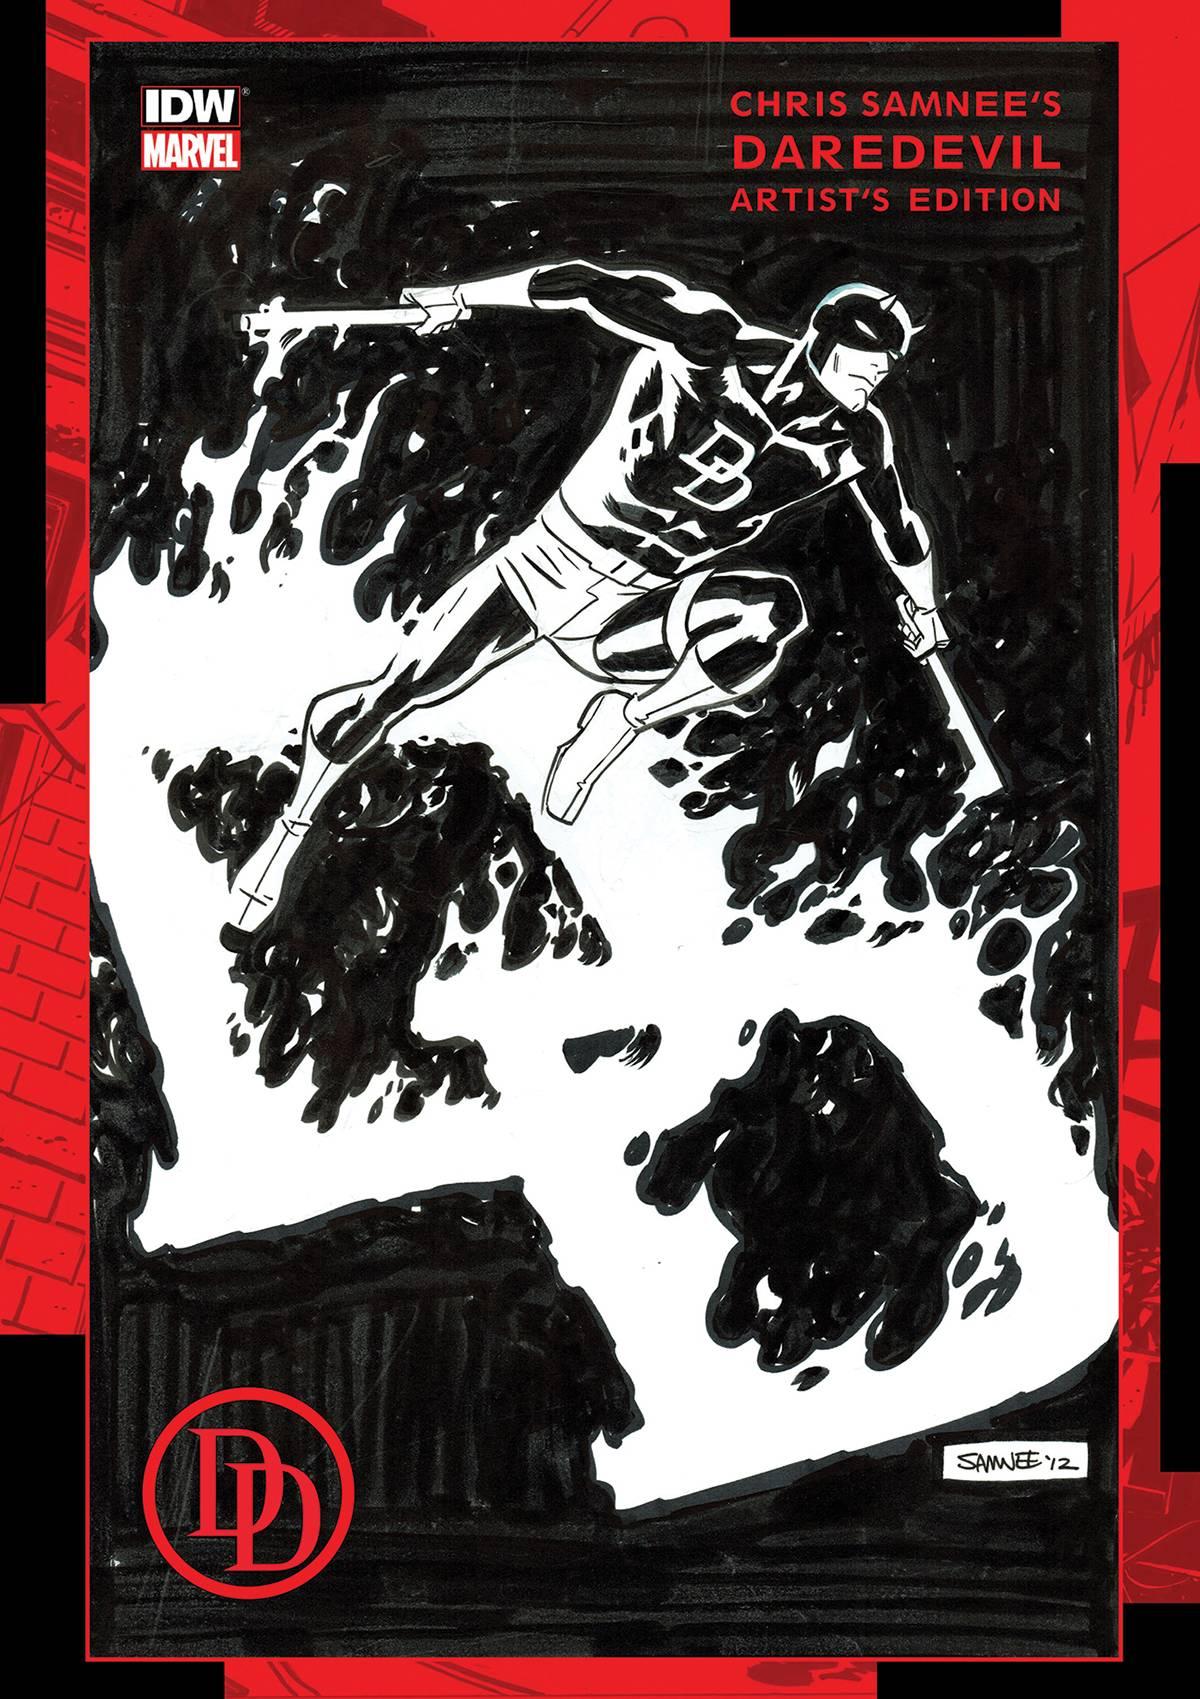 Review | Chris Samnee's Daredevil Artist's Edition